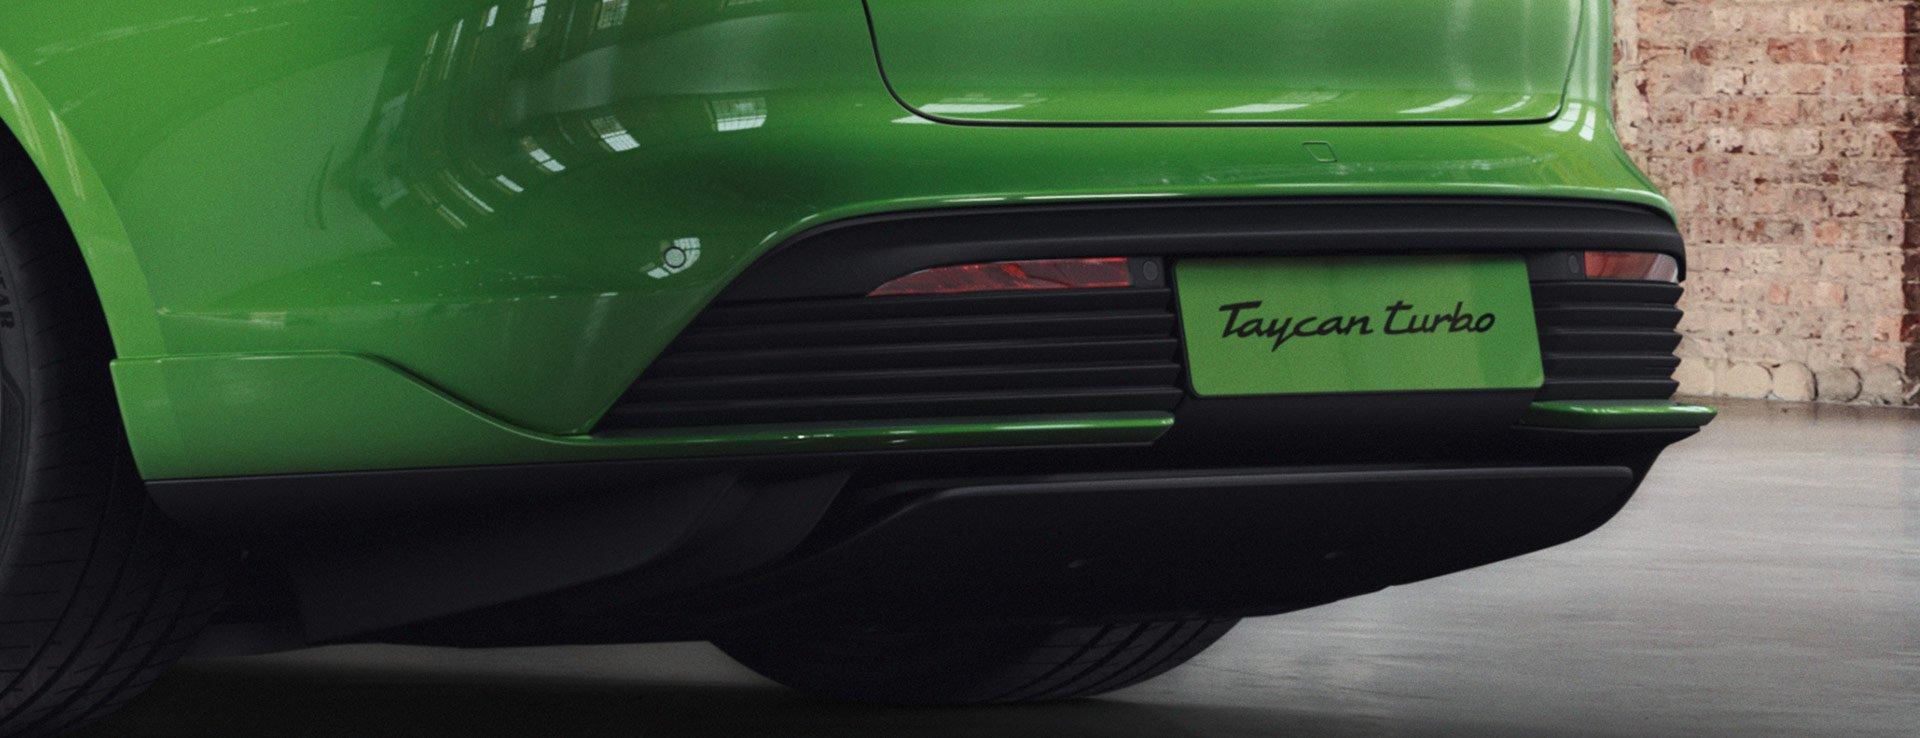 Porsche-Exclusive-Taycan-Turbo-9